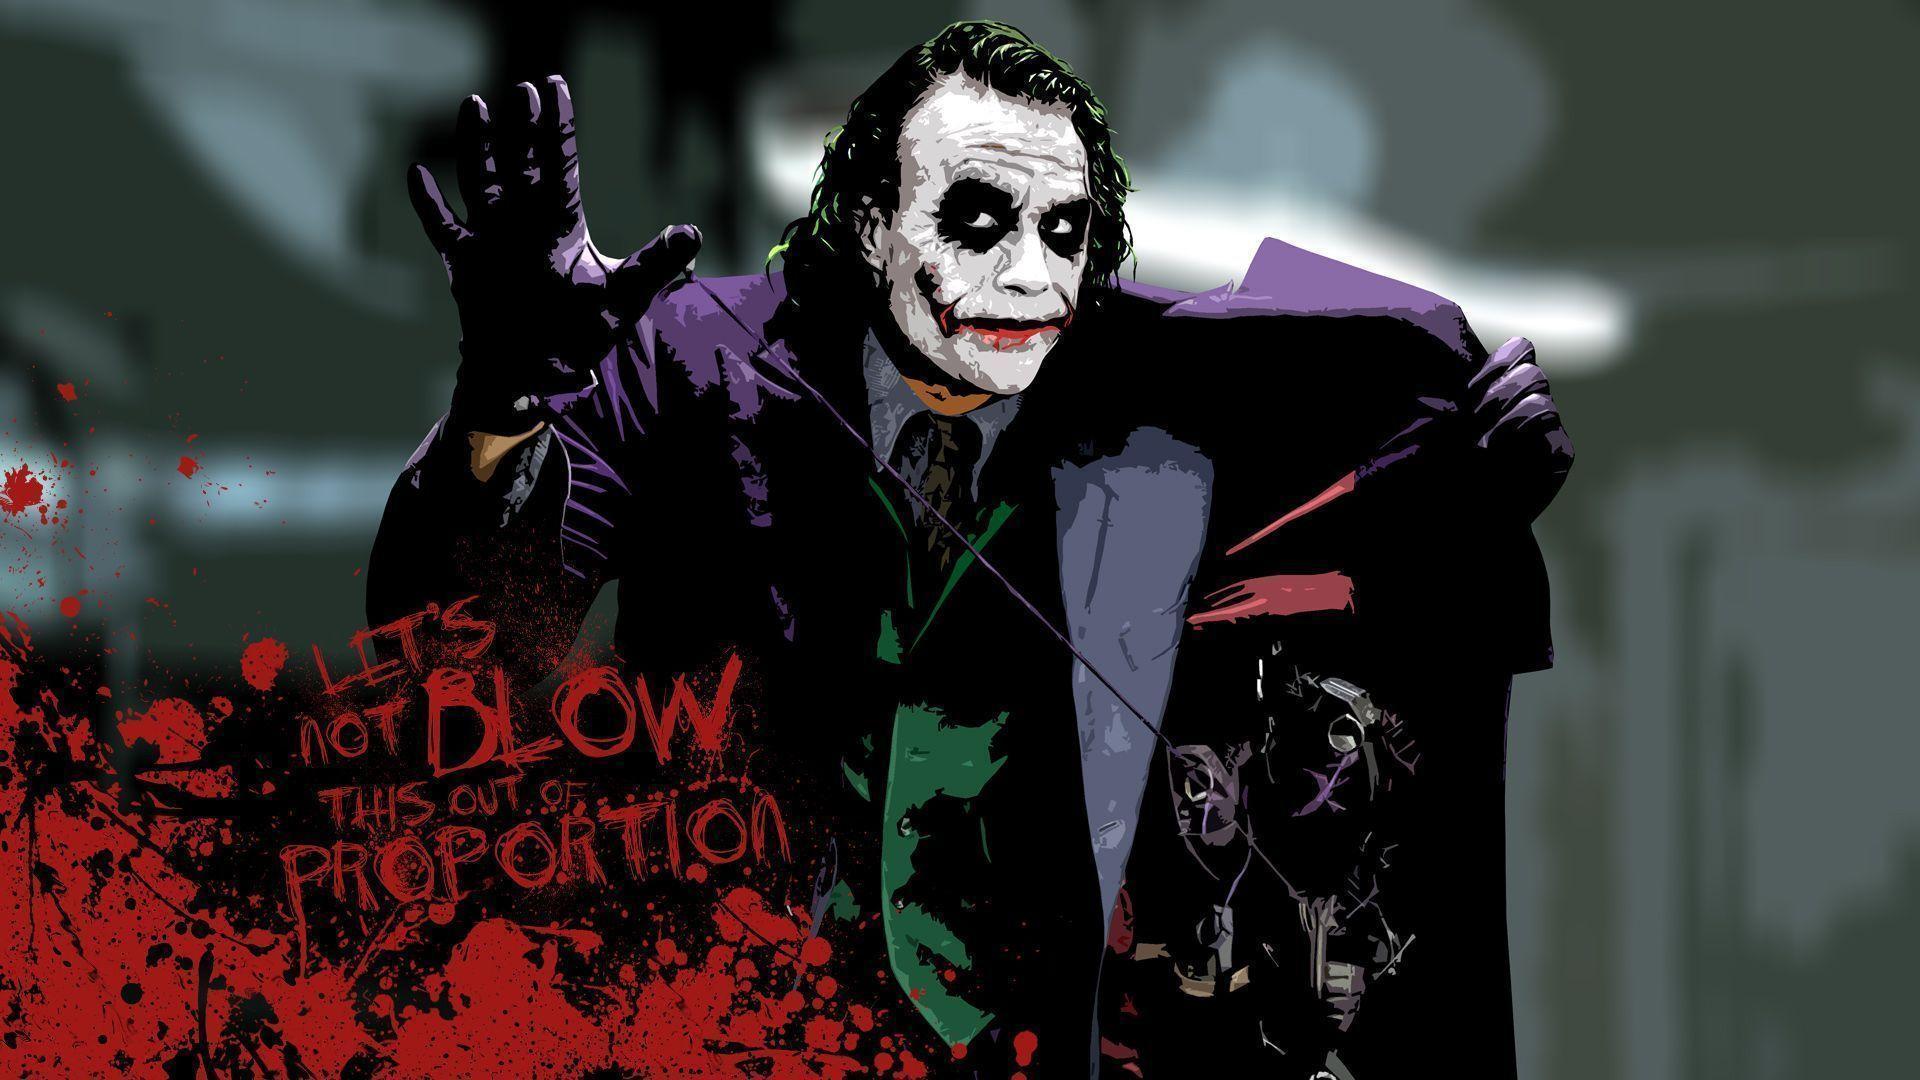 Heath Ledger Joker Wallpapers - Wallpaper Cave